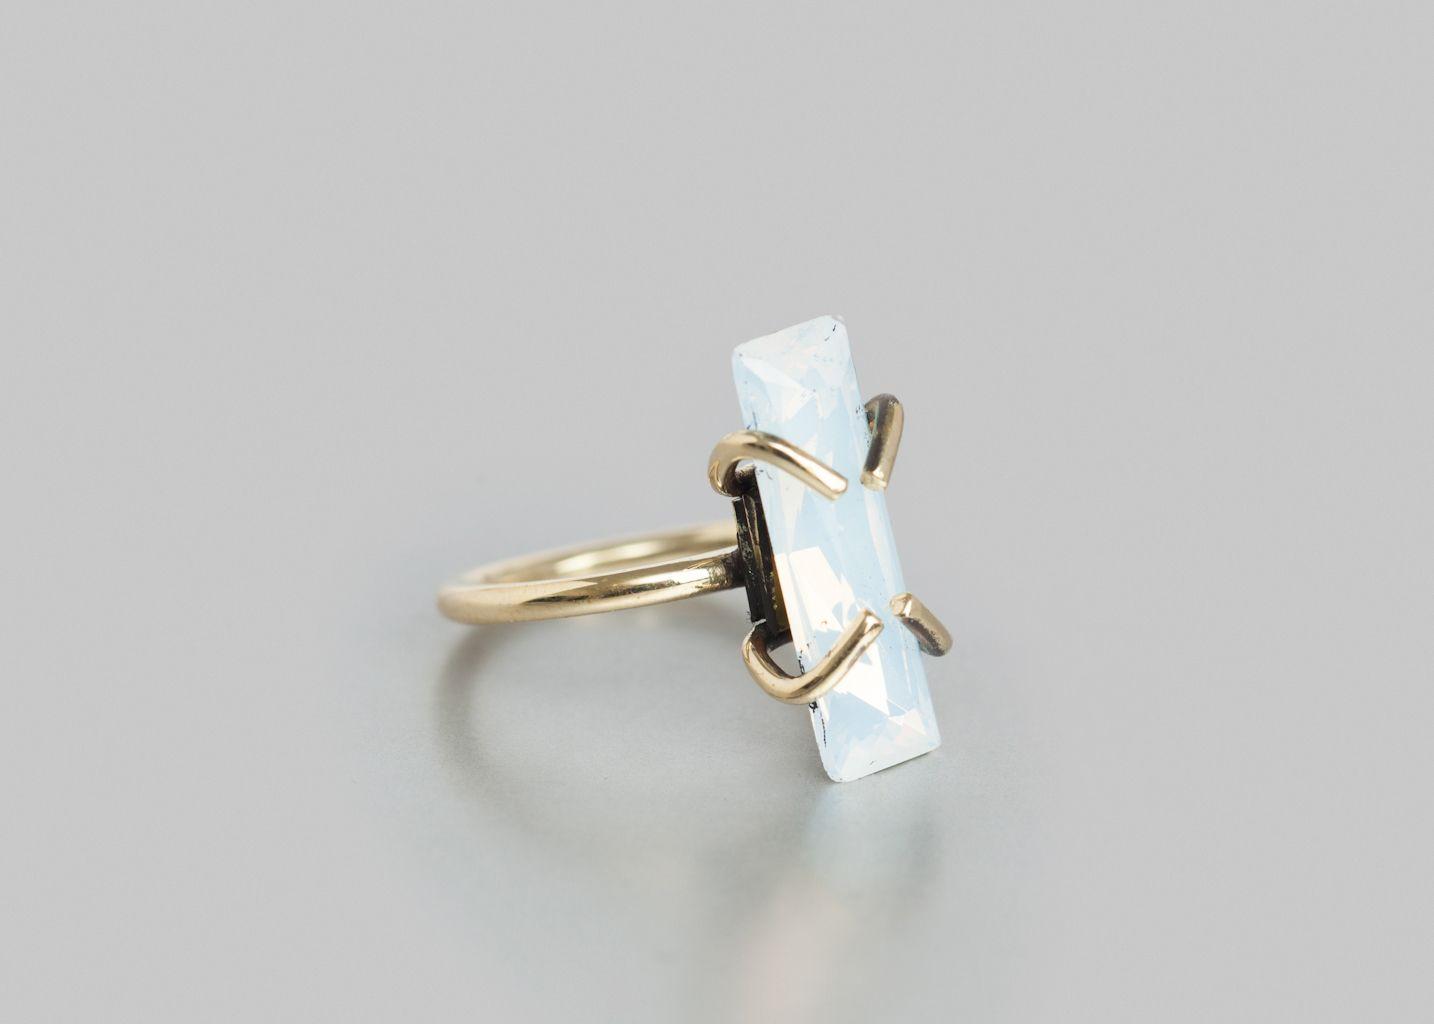 Baguette Boho Ring - Mimilamour